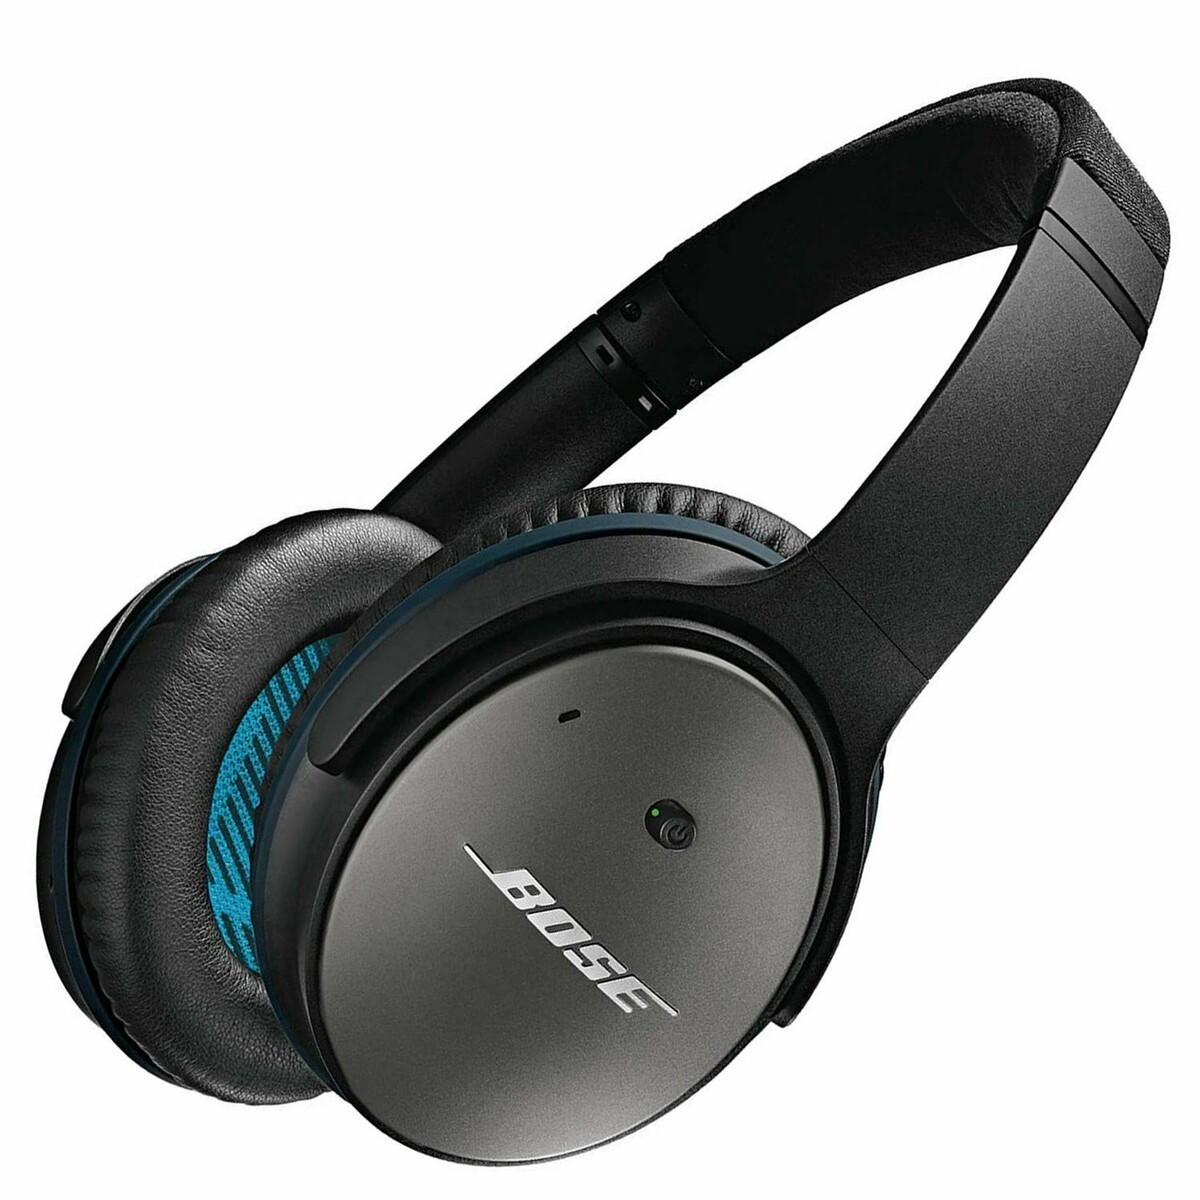 Bose QC25 on-ear headphones